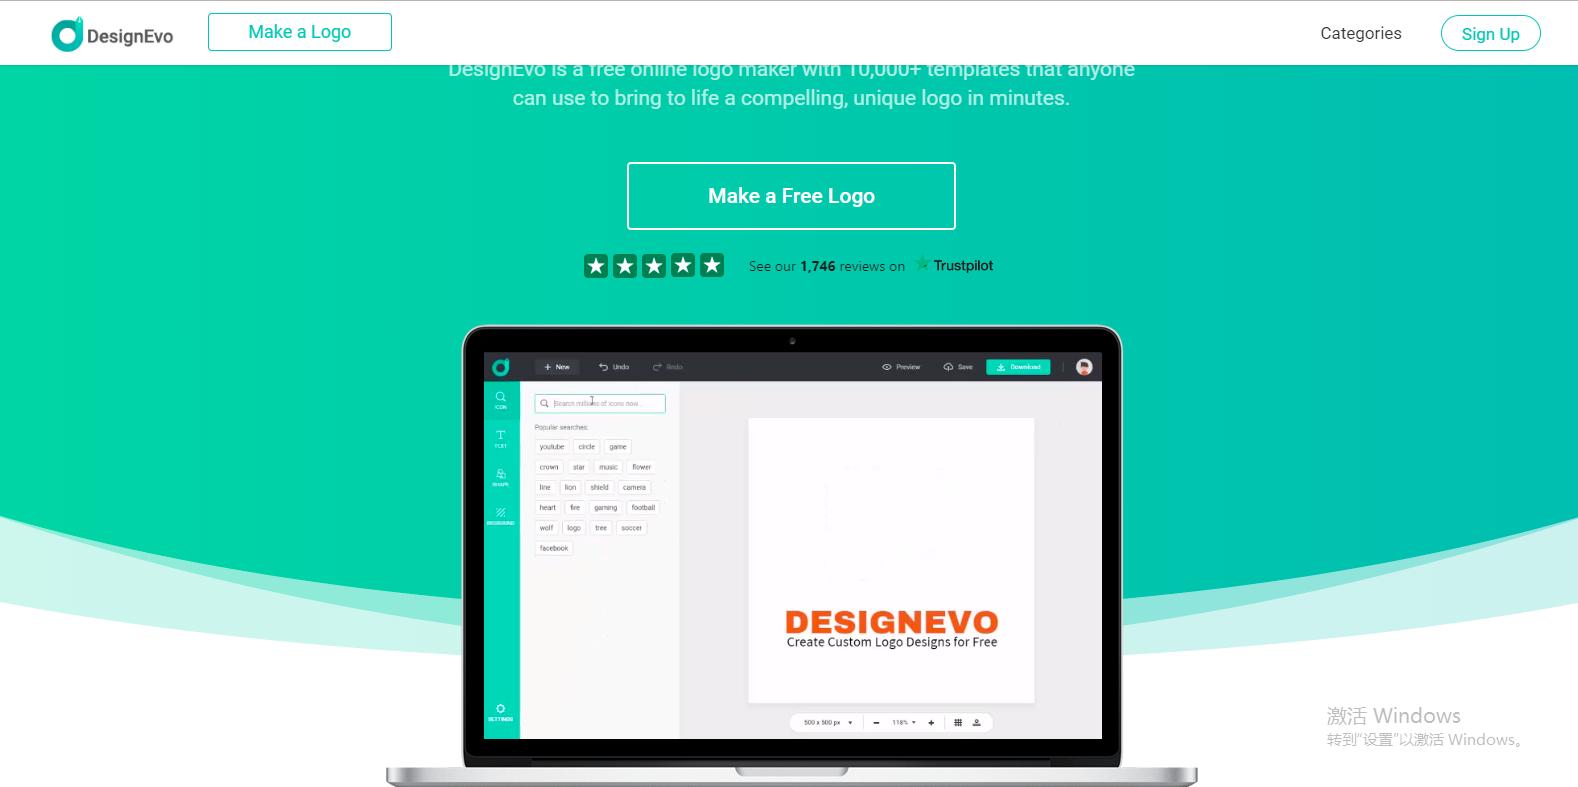 Design Logos Online with DesignEvo